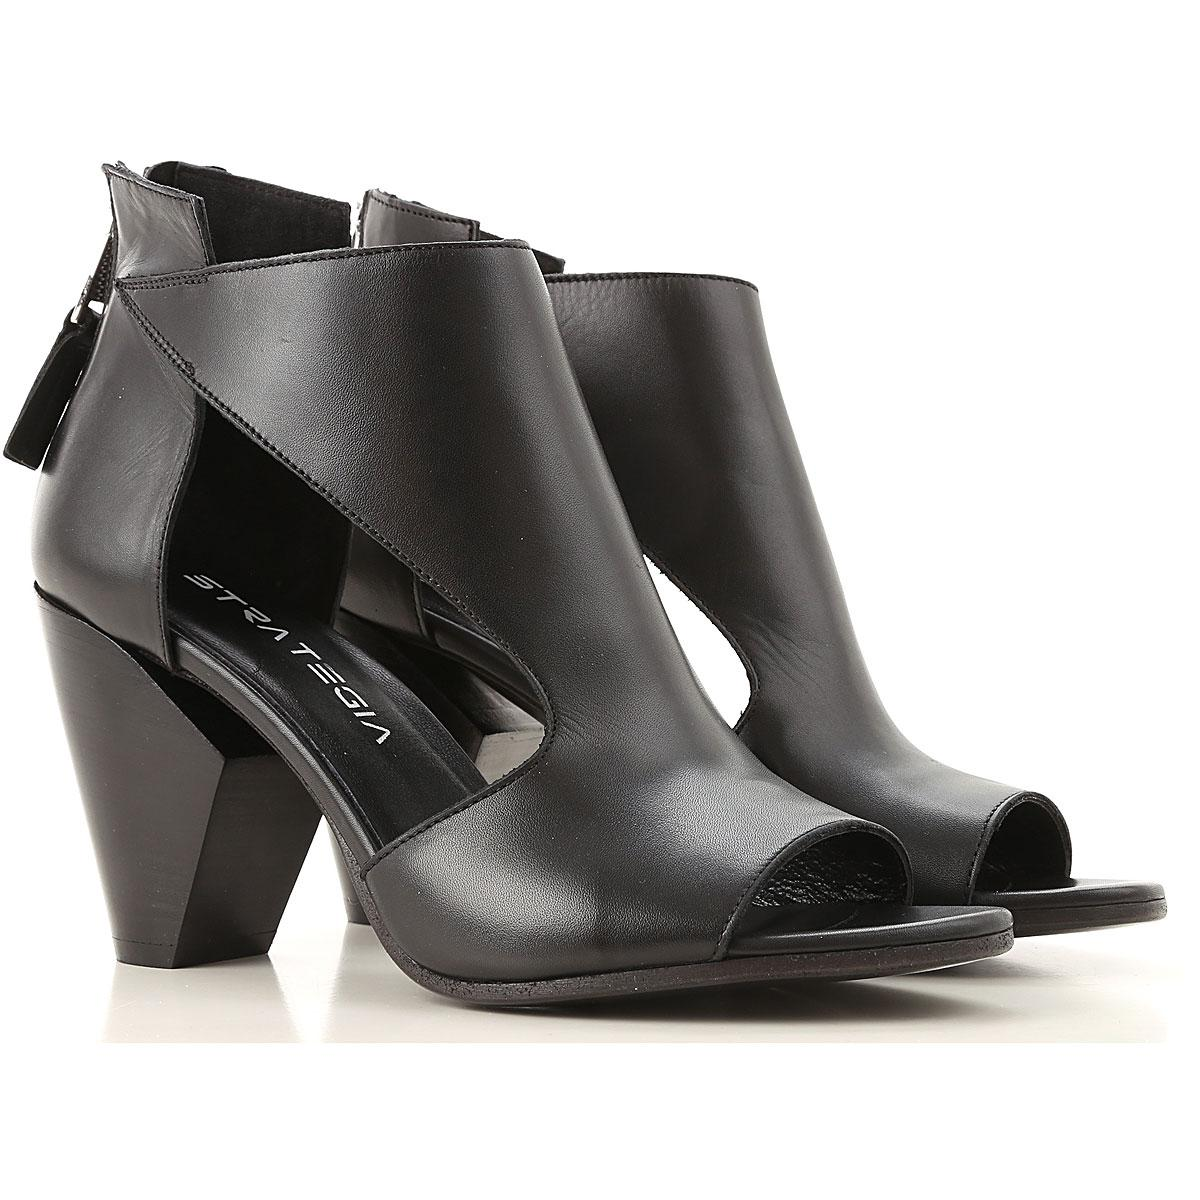 61e82c2d09d Strategia Sandals For Women in Black - Lyst